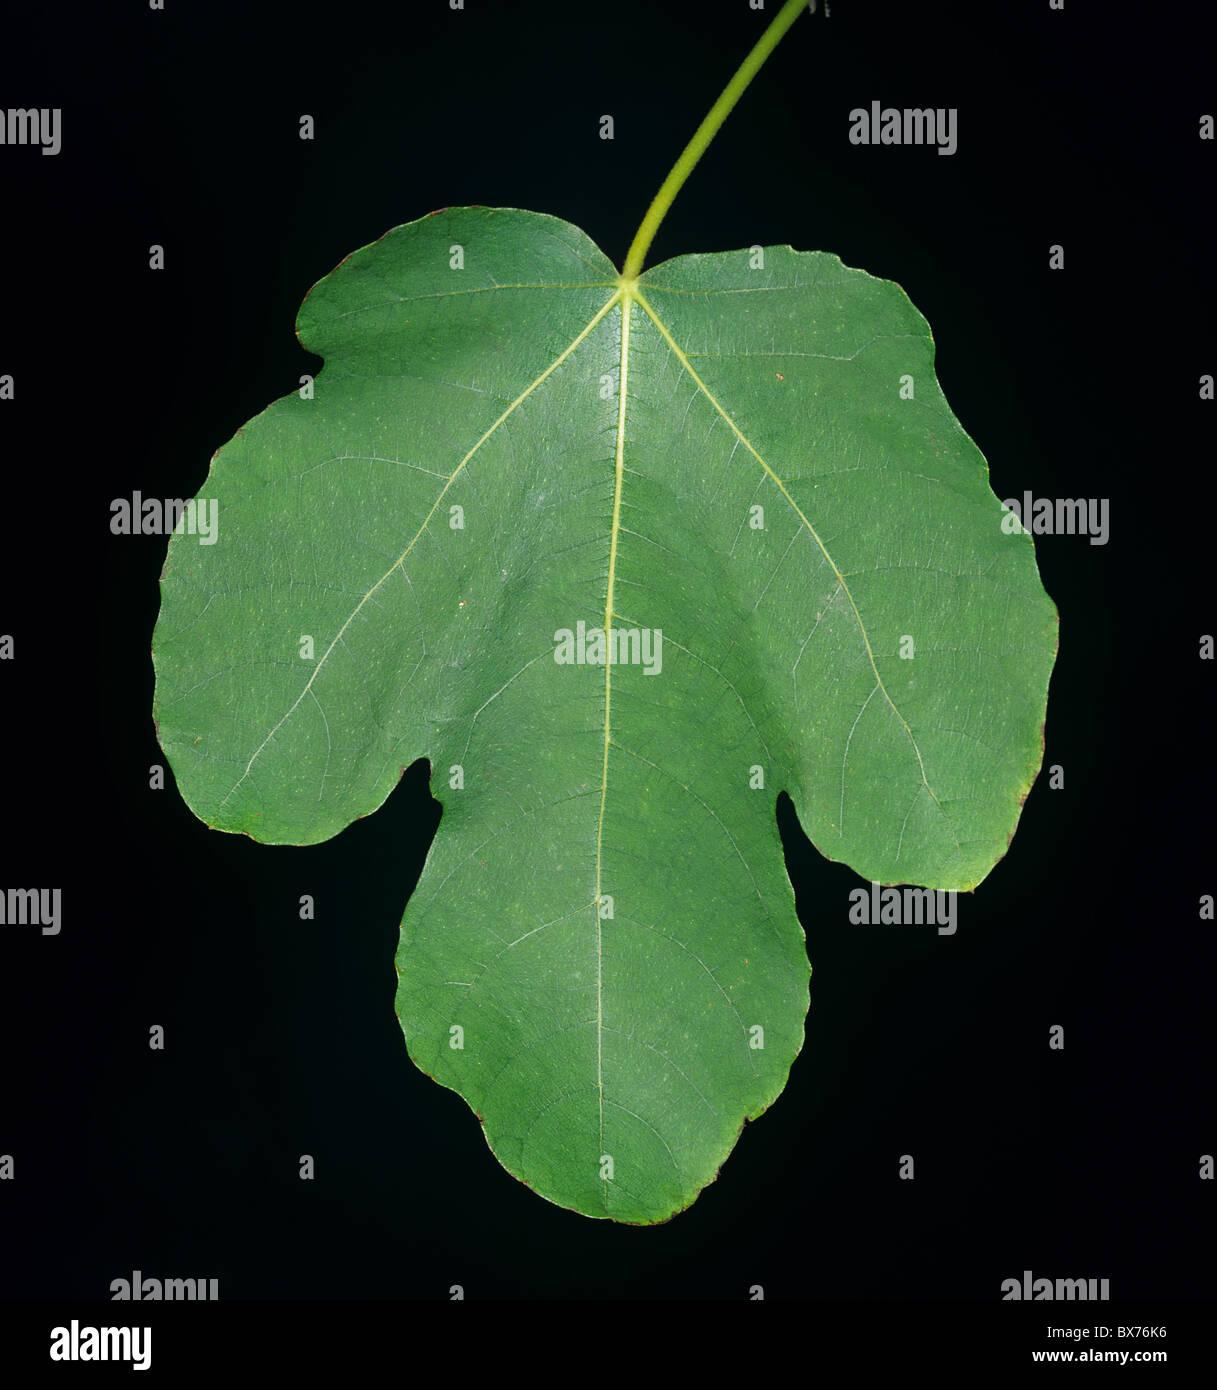 Symbolic shape of a fig leaf on the tree - Stock Image